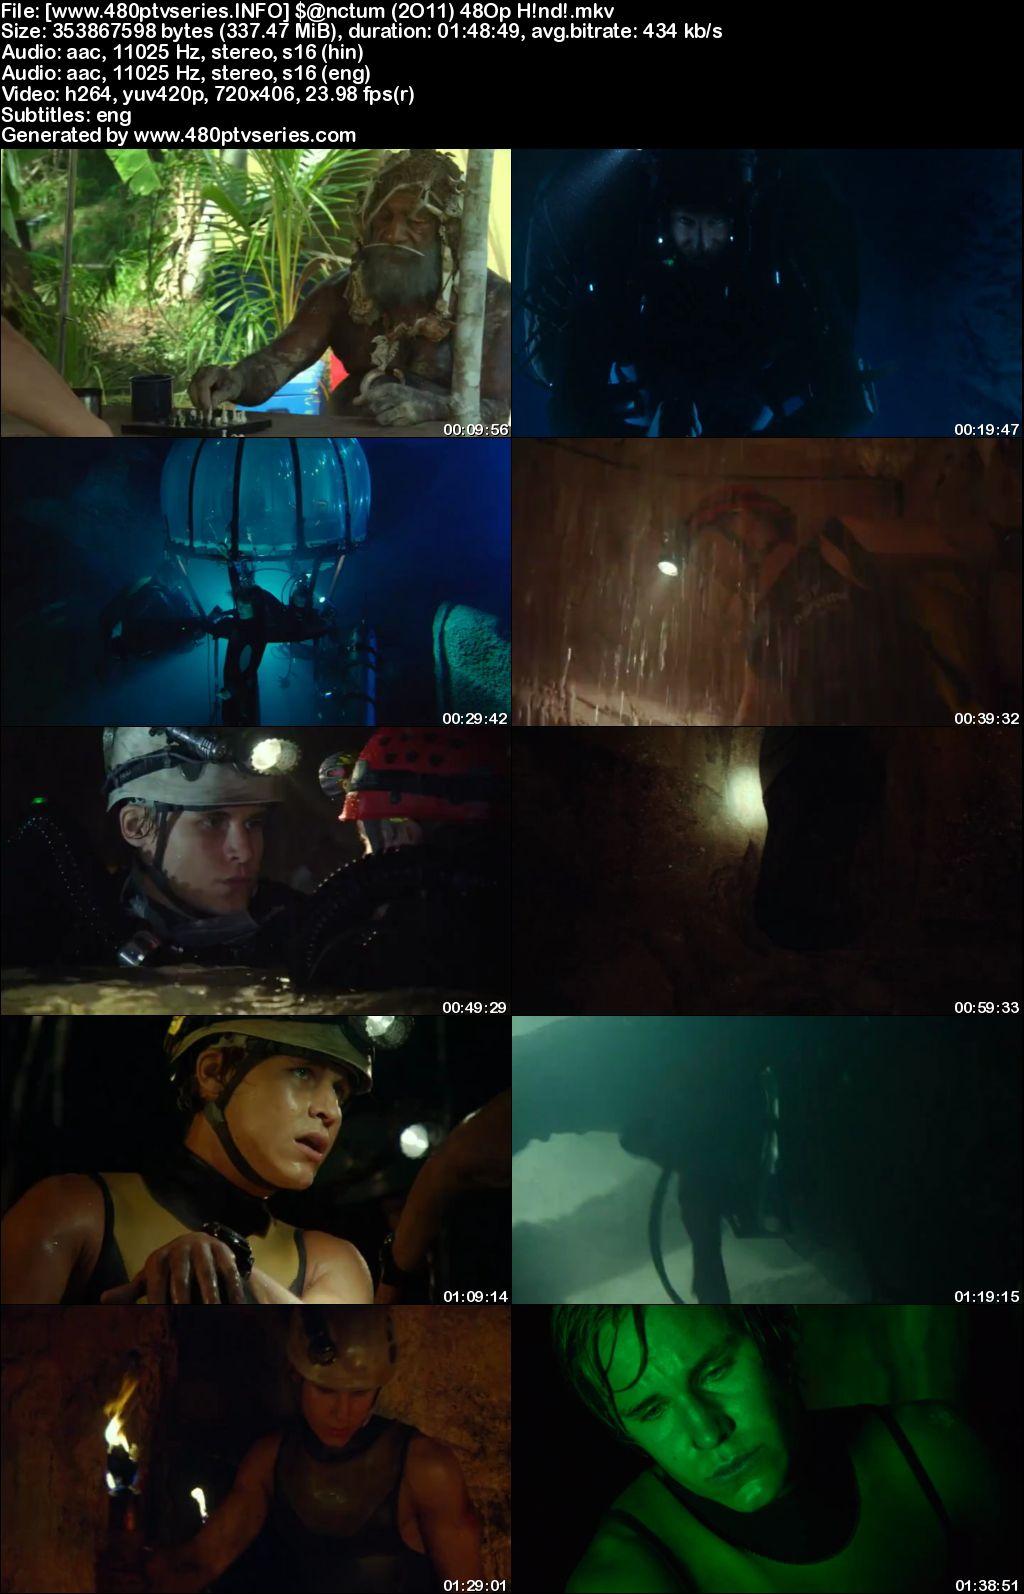 Sanctum (2011) 300MB Full Hindi Dual Audio Movie Download 480p Bluray Free Watch Online Full Movie Download Worldfree4u 9xmovies